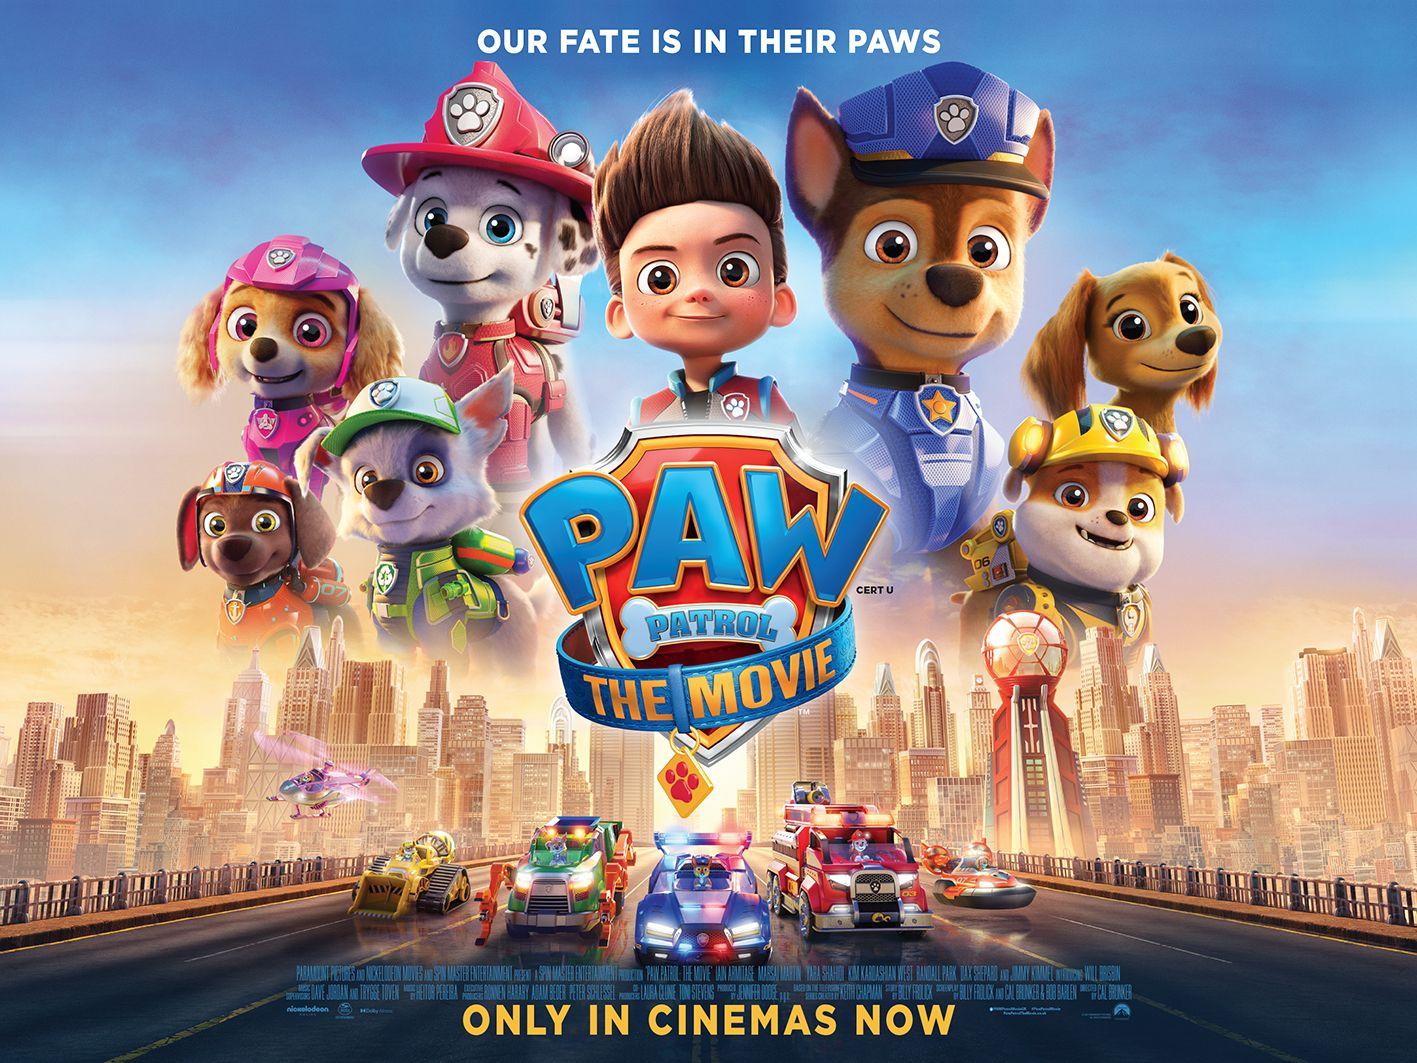 Paw Patrol film poster